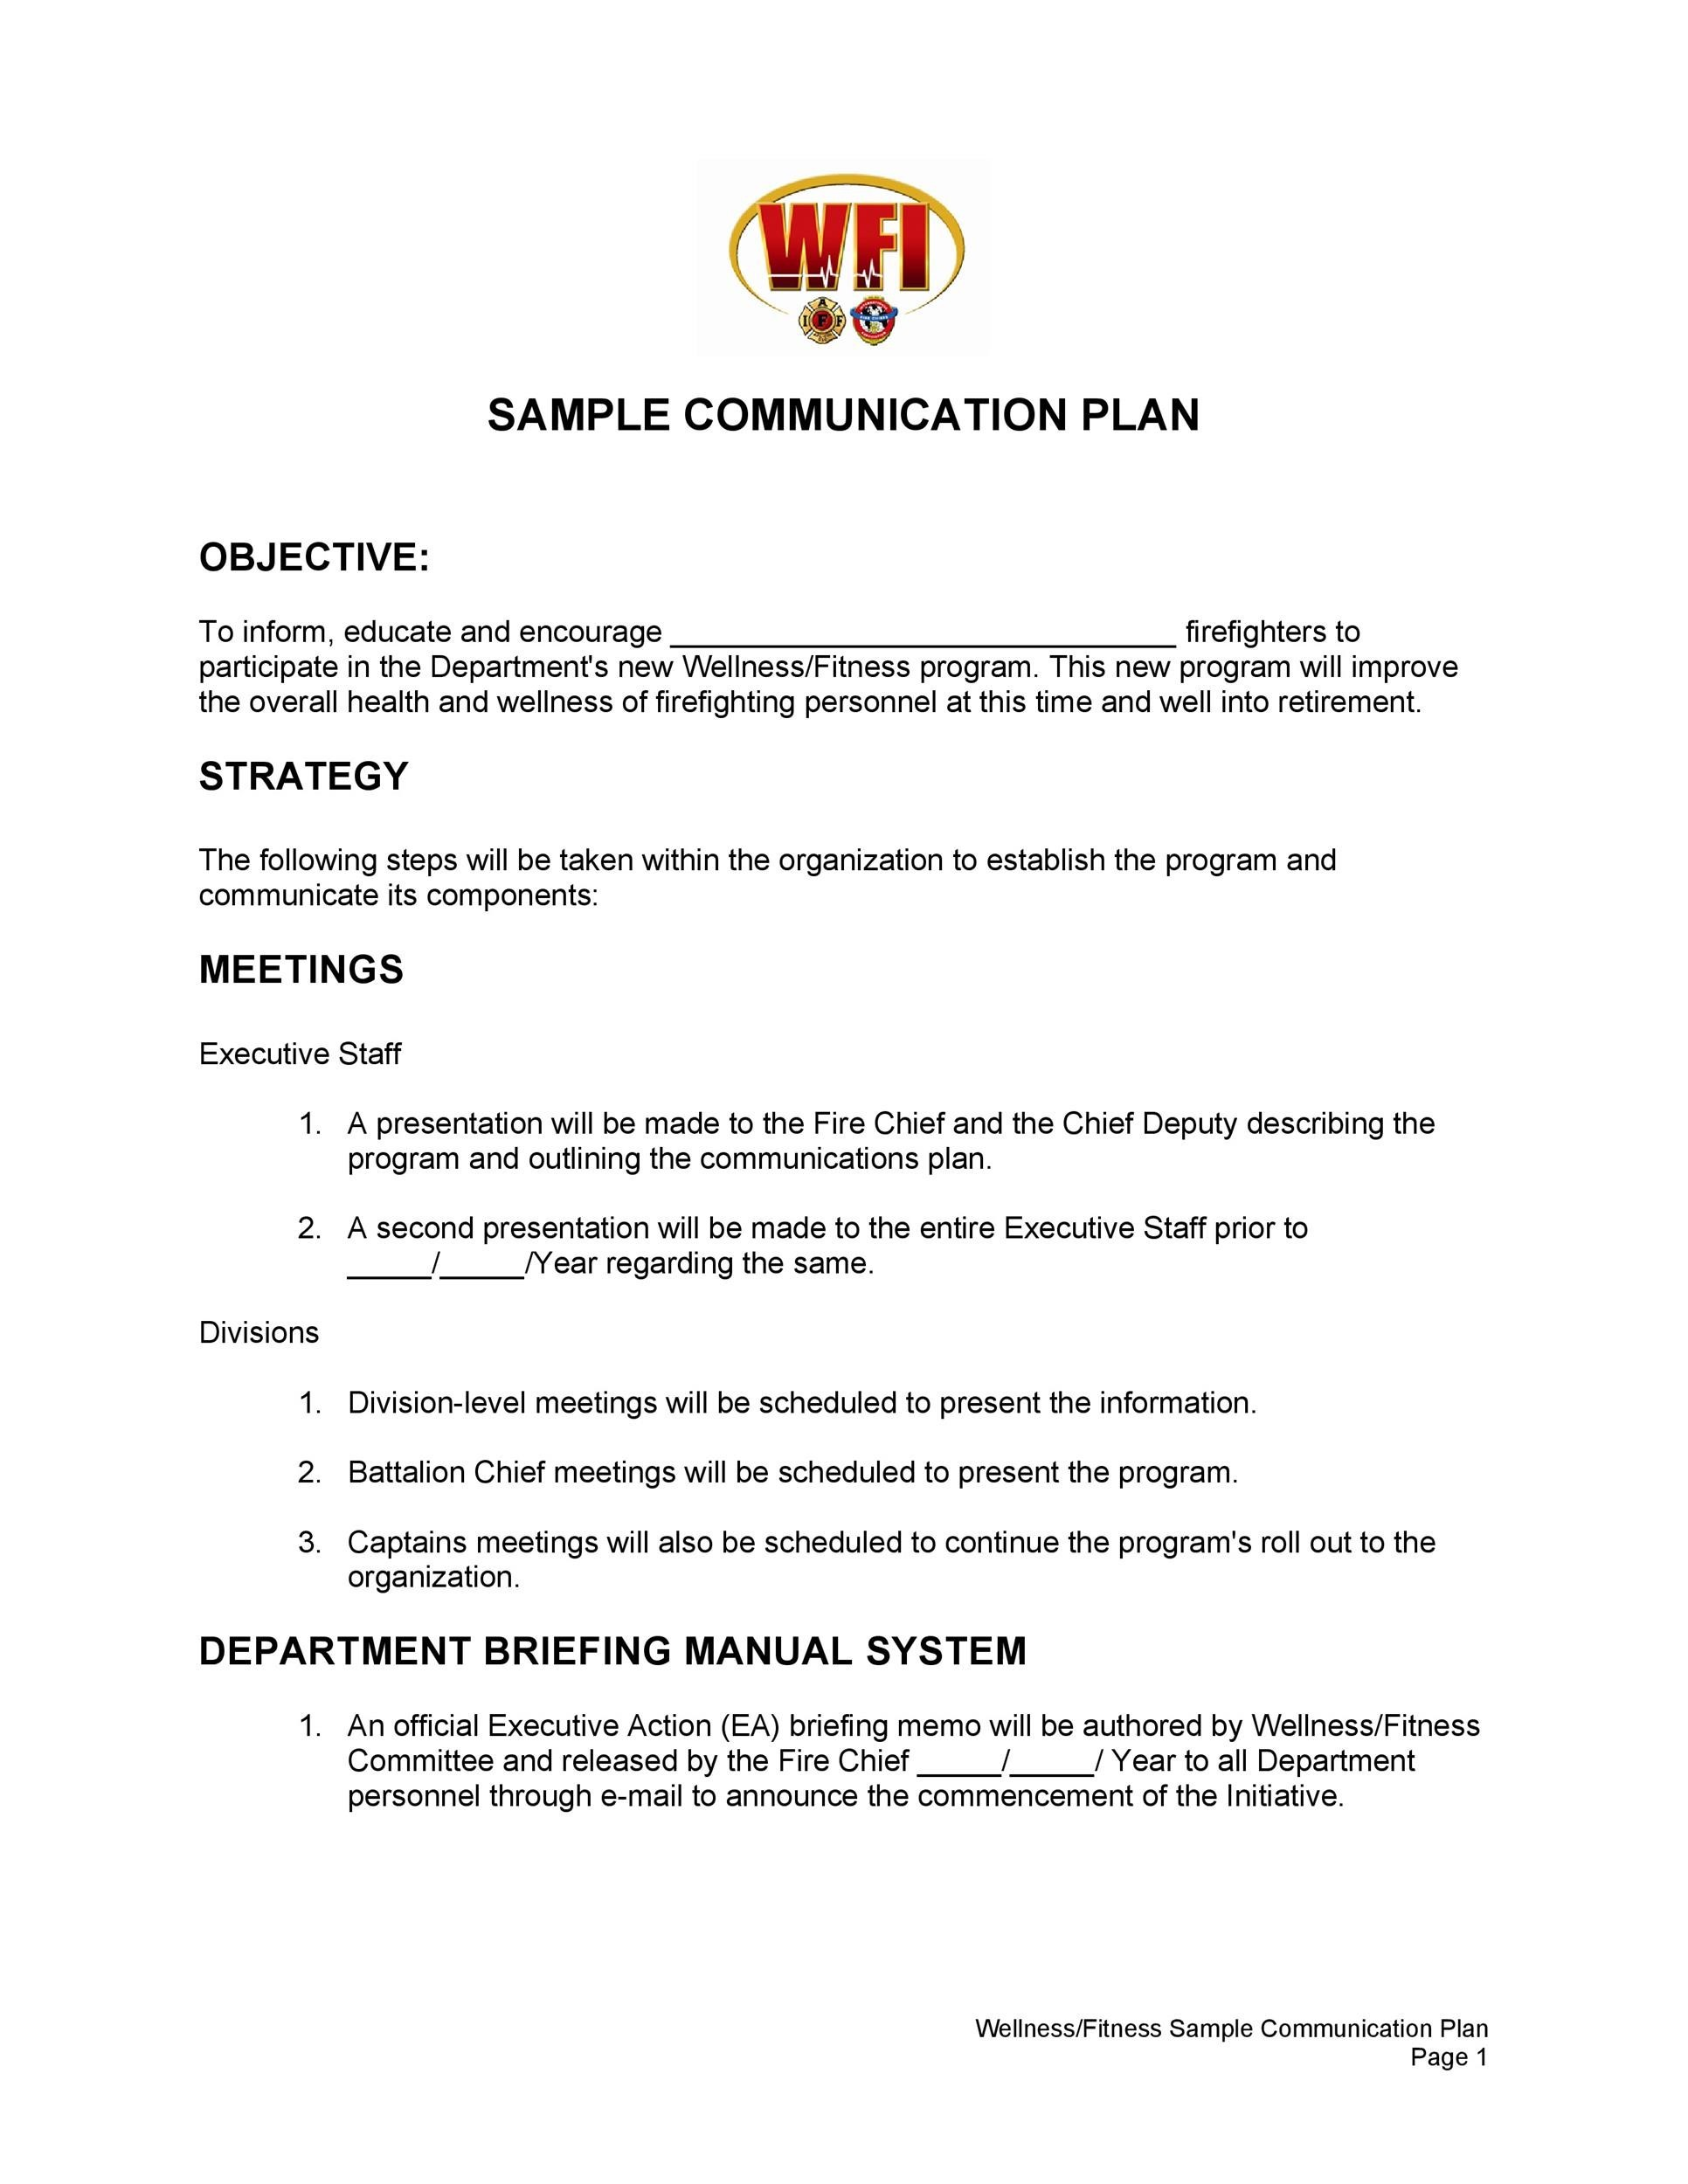 Free Communication Plan Template 05